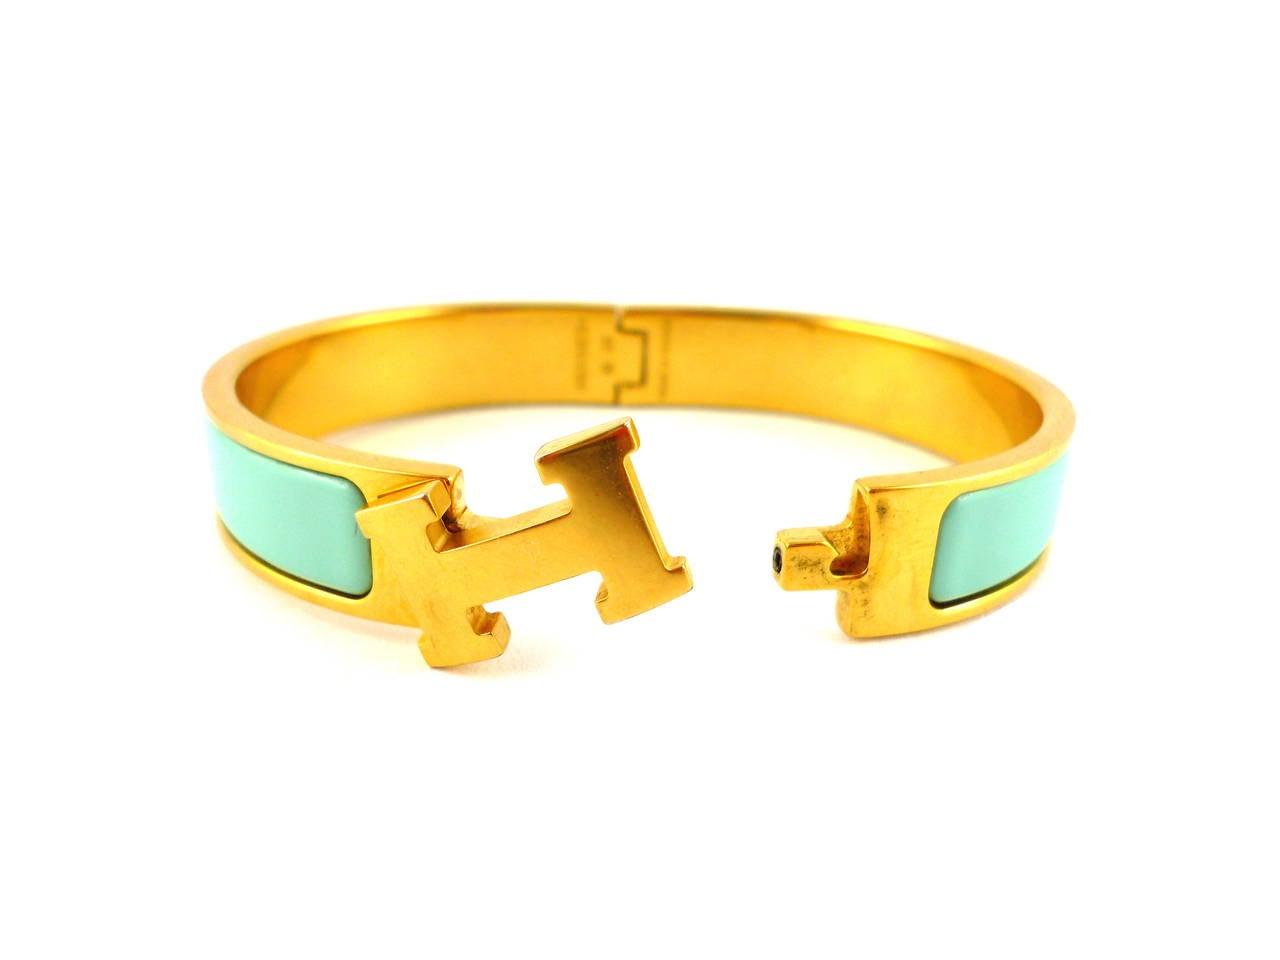 hermes lagoon blue clic clac h enamel bracelet narrow at. Black Bedroom Furniture Sets. Home Design Ideas